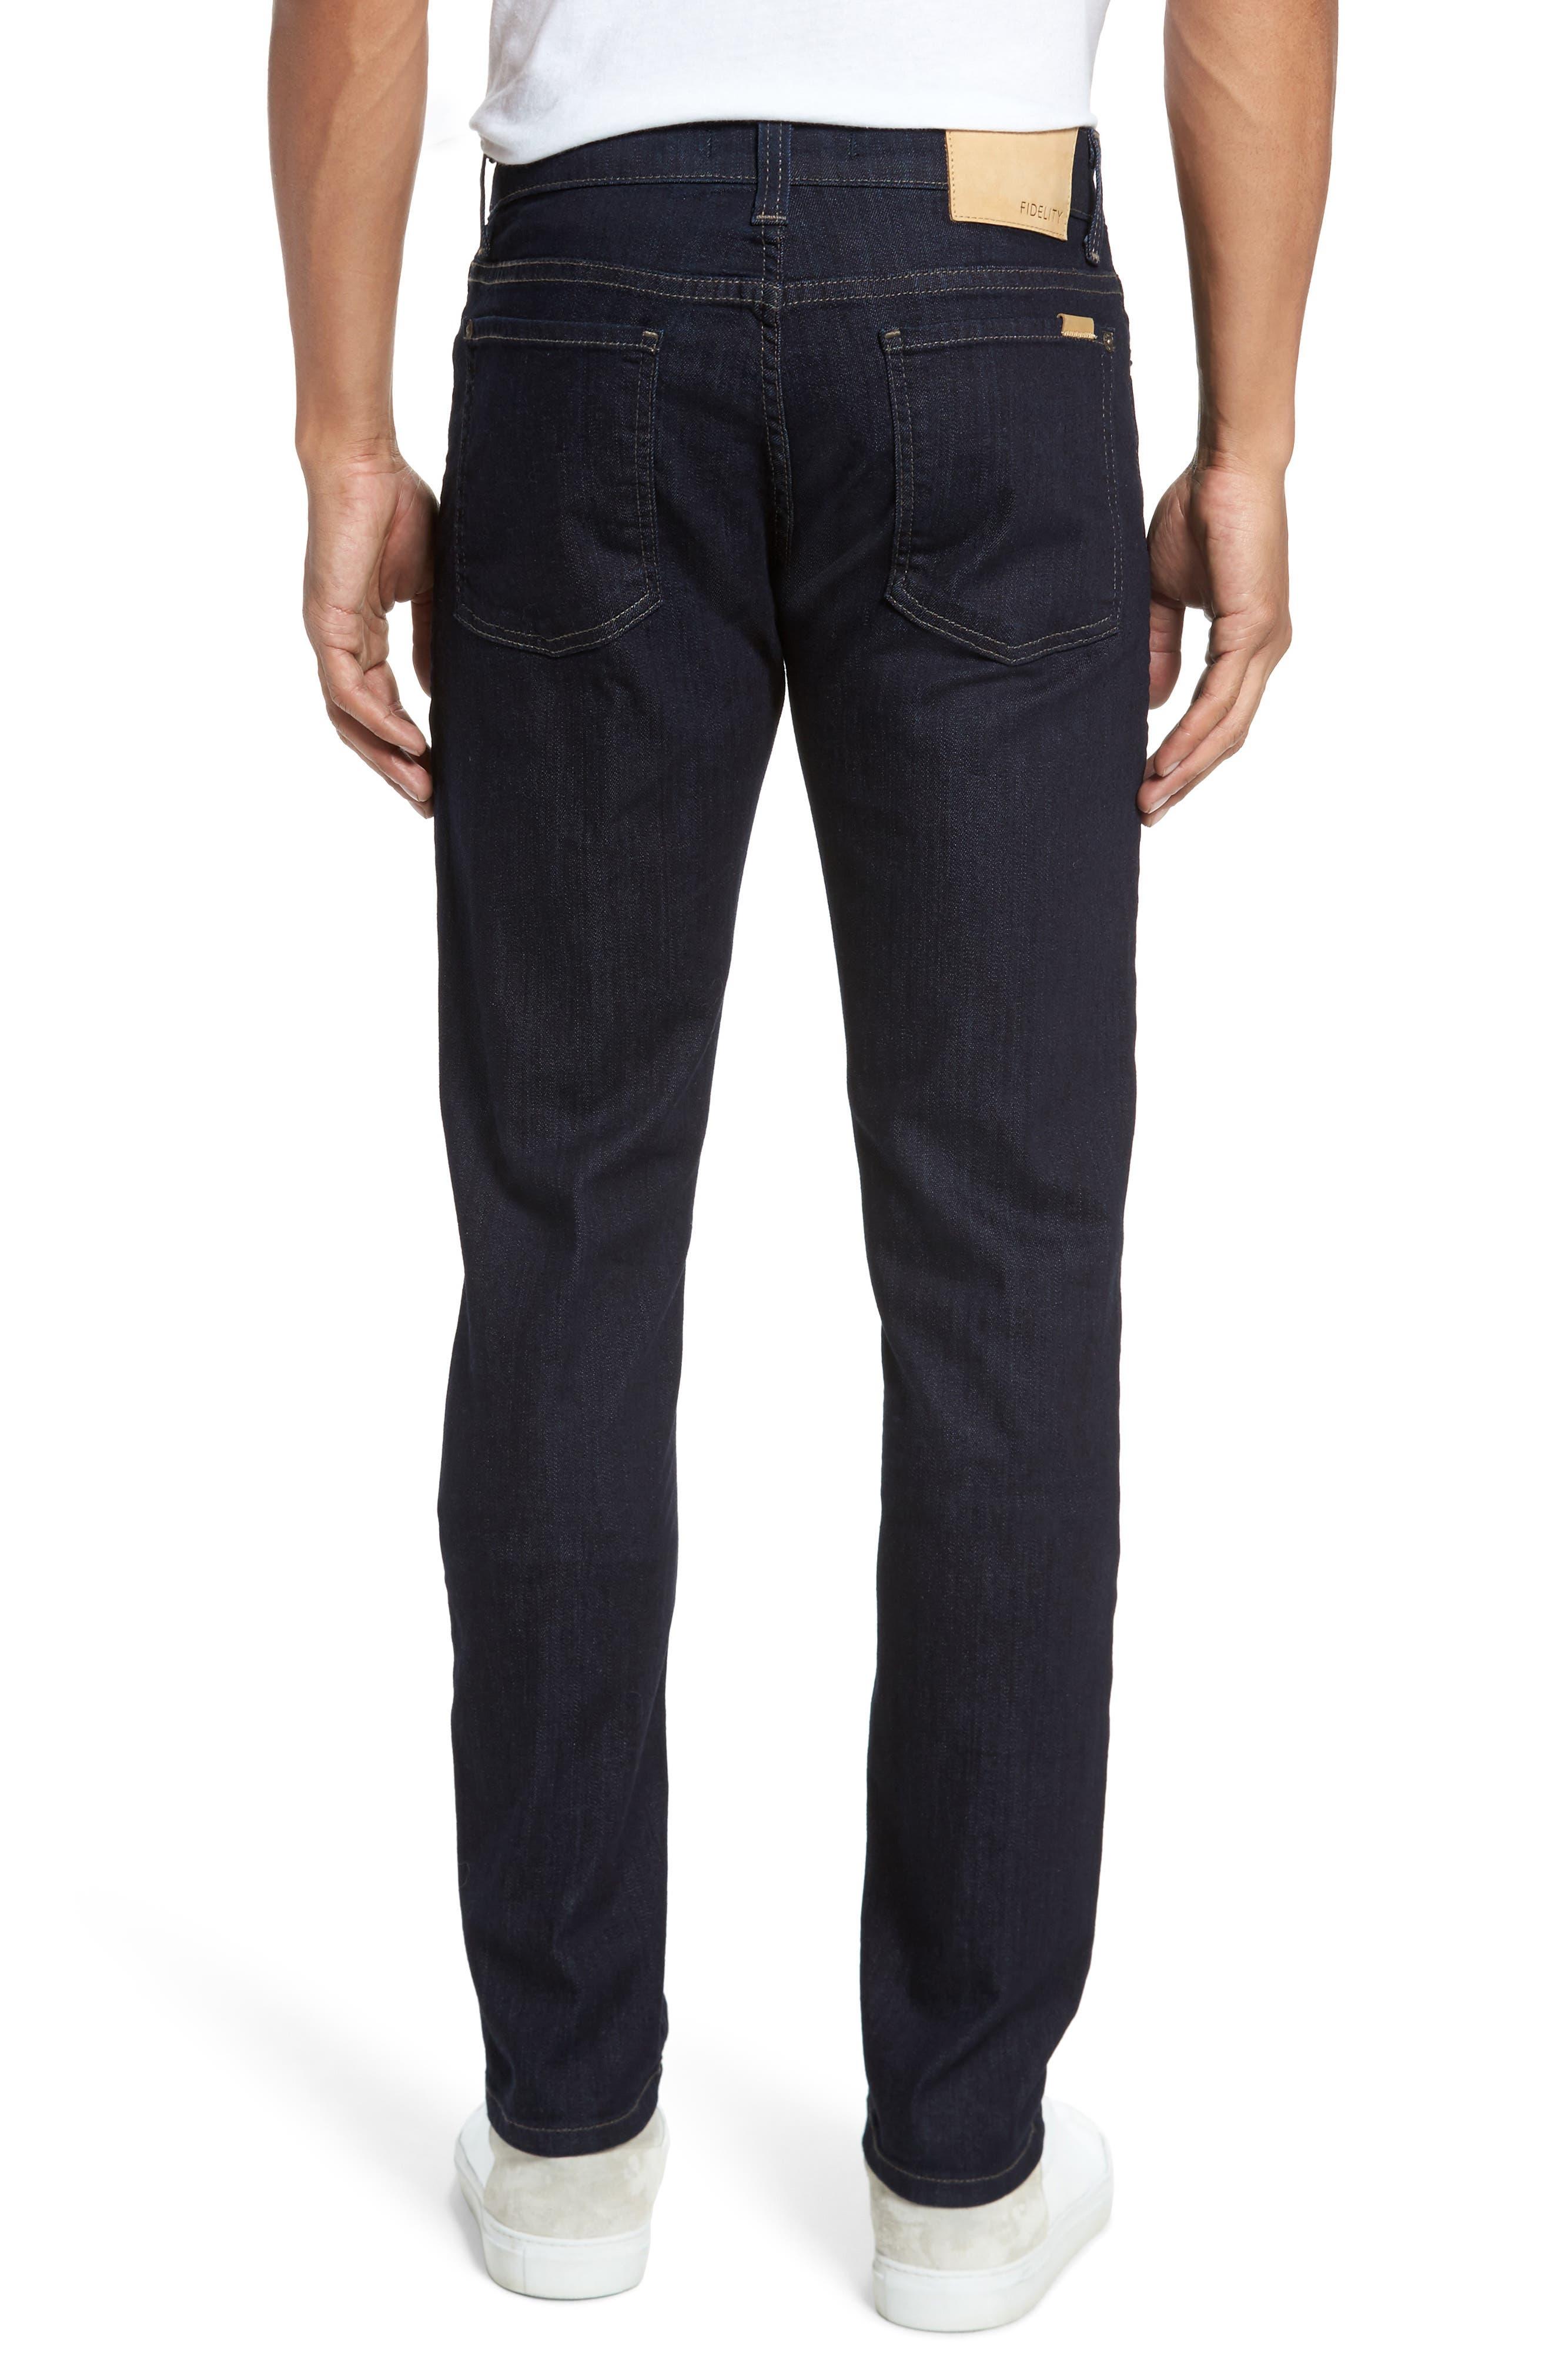 Alternate Image 2  - Fidelity Denim Slim Fit Jeans (Galaxy)